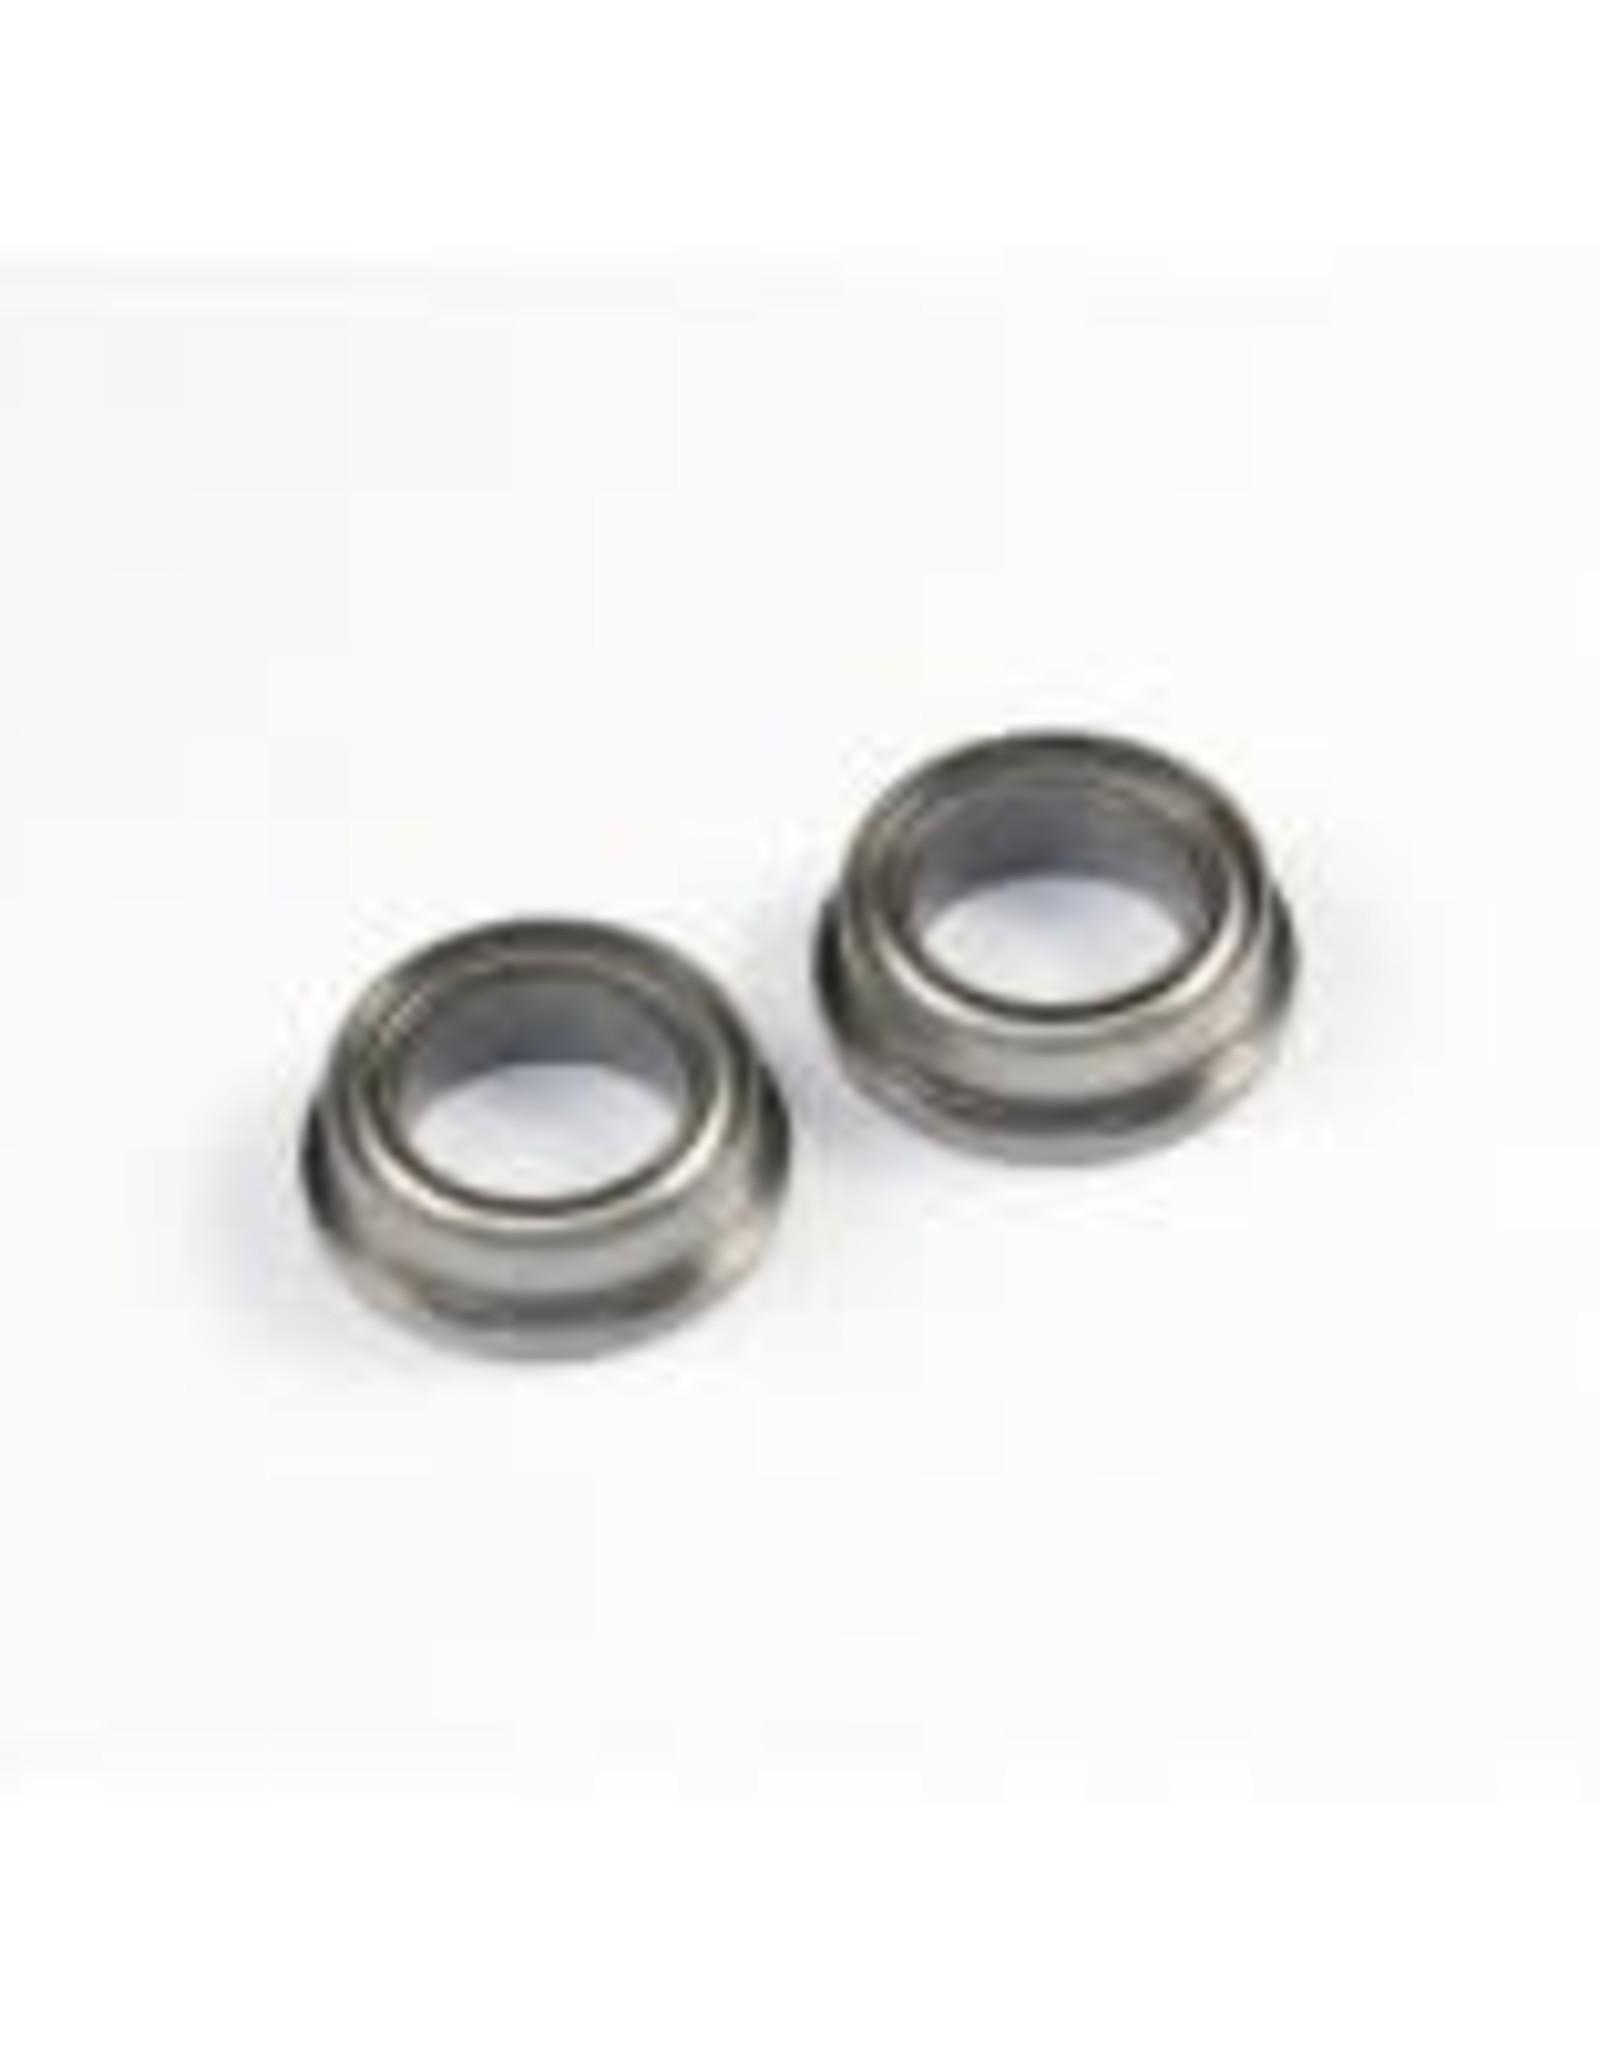 Roche Bearing, 3/8 x 1/4, Flanged, 2 pcs